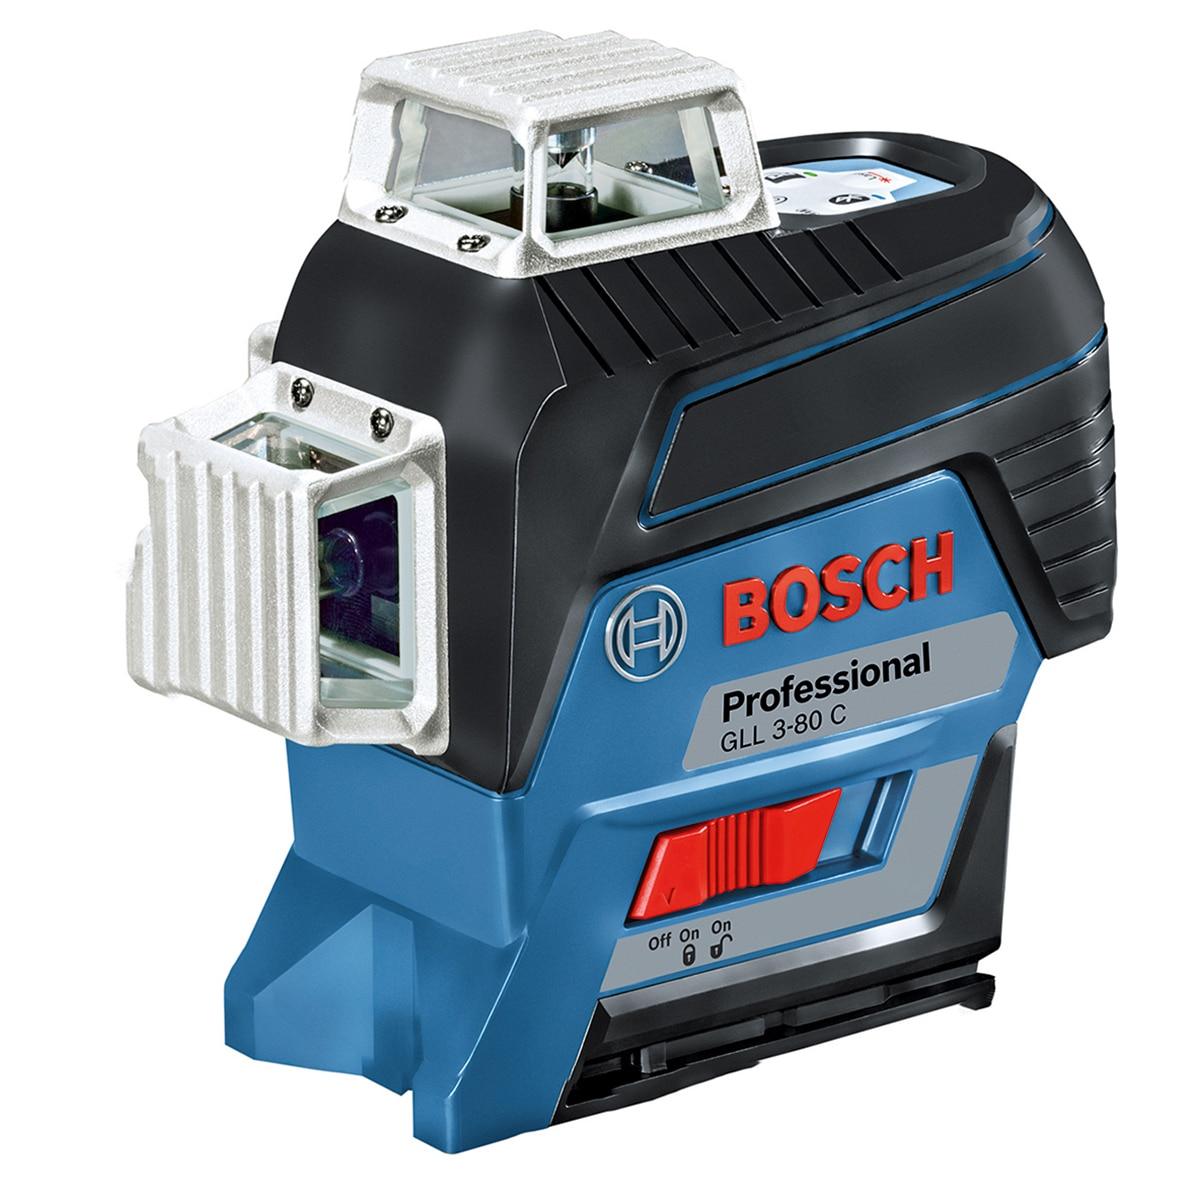 Fotografie Nivela laser cu linii Bosch Professional GLL 3-80 C, 30 m, ± 0.2 mm/m precizie, 650 nm dioda laser, clasa laser 2, IP 54, proiectie 3 linii la 360°, accesorii incluse